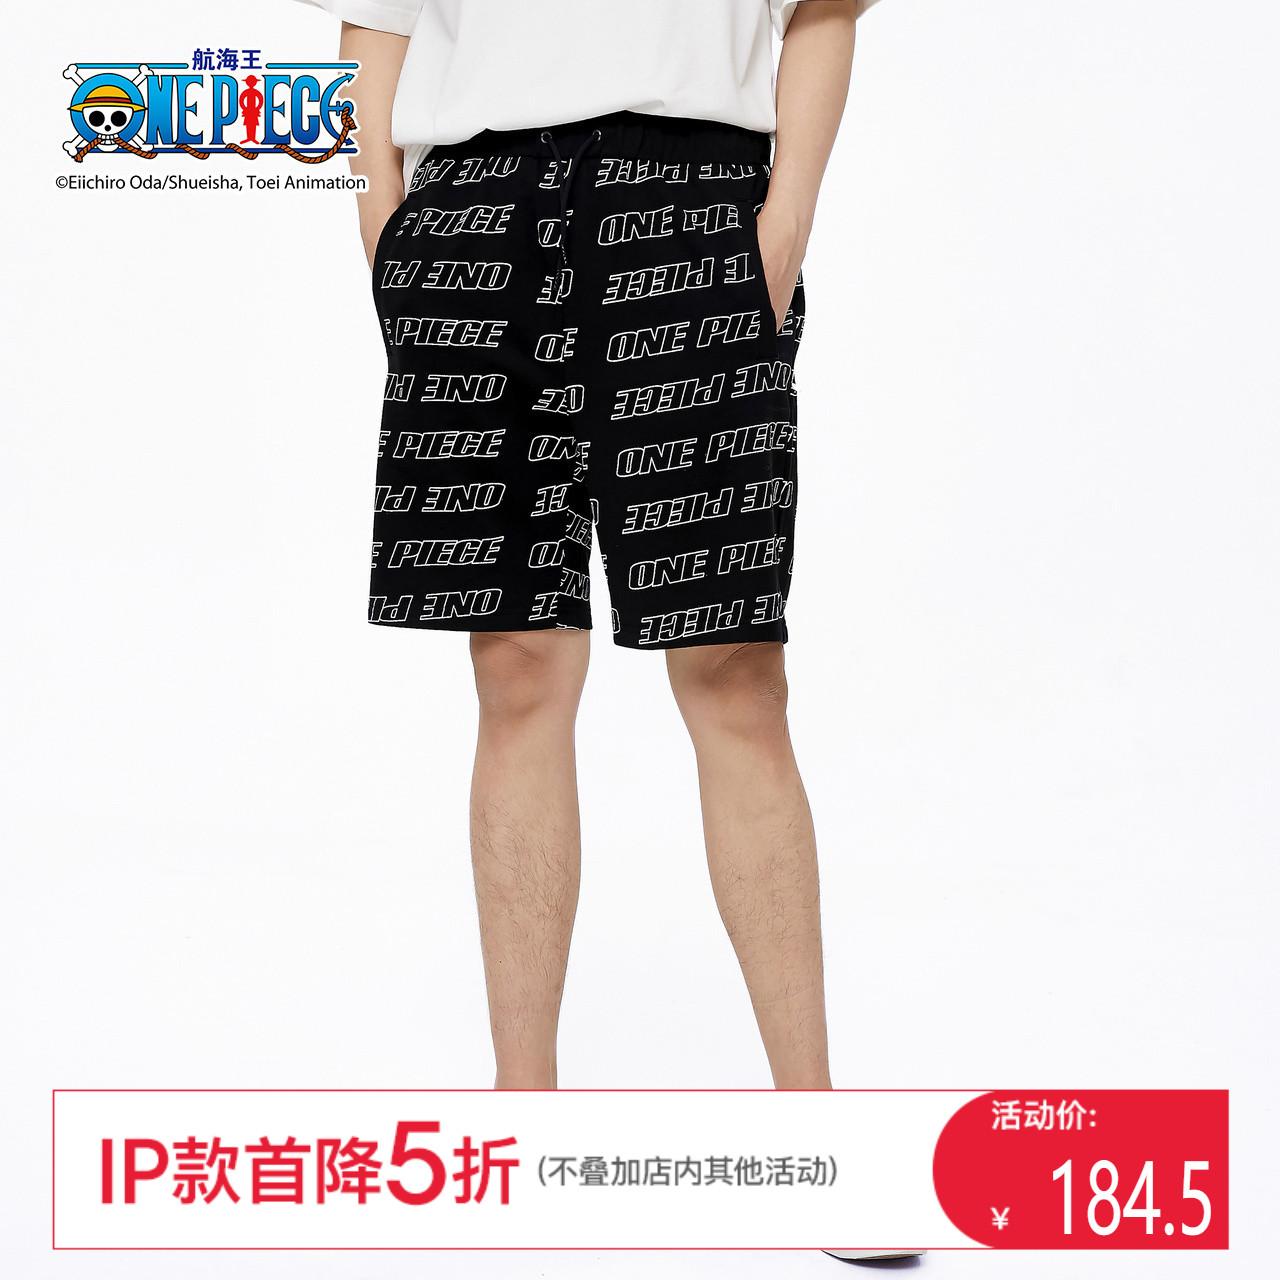 Baleno班尼路 航海王字母涂鸦印花针织短裤宽松五分裤休闲裤